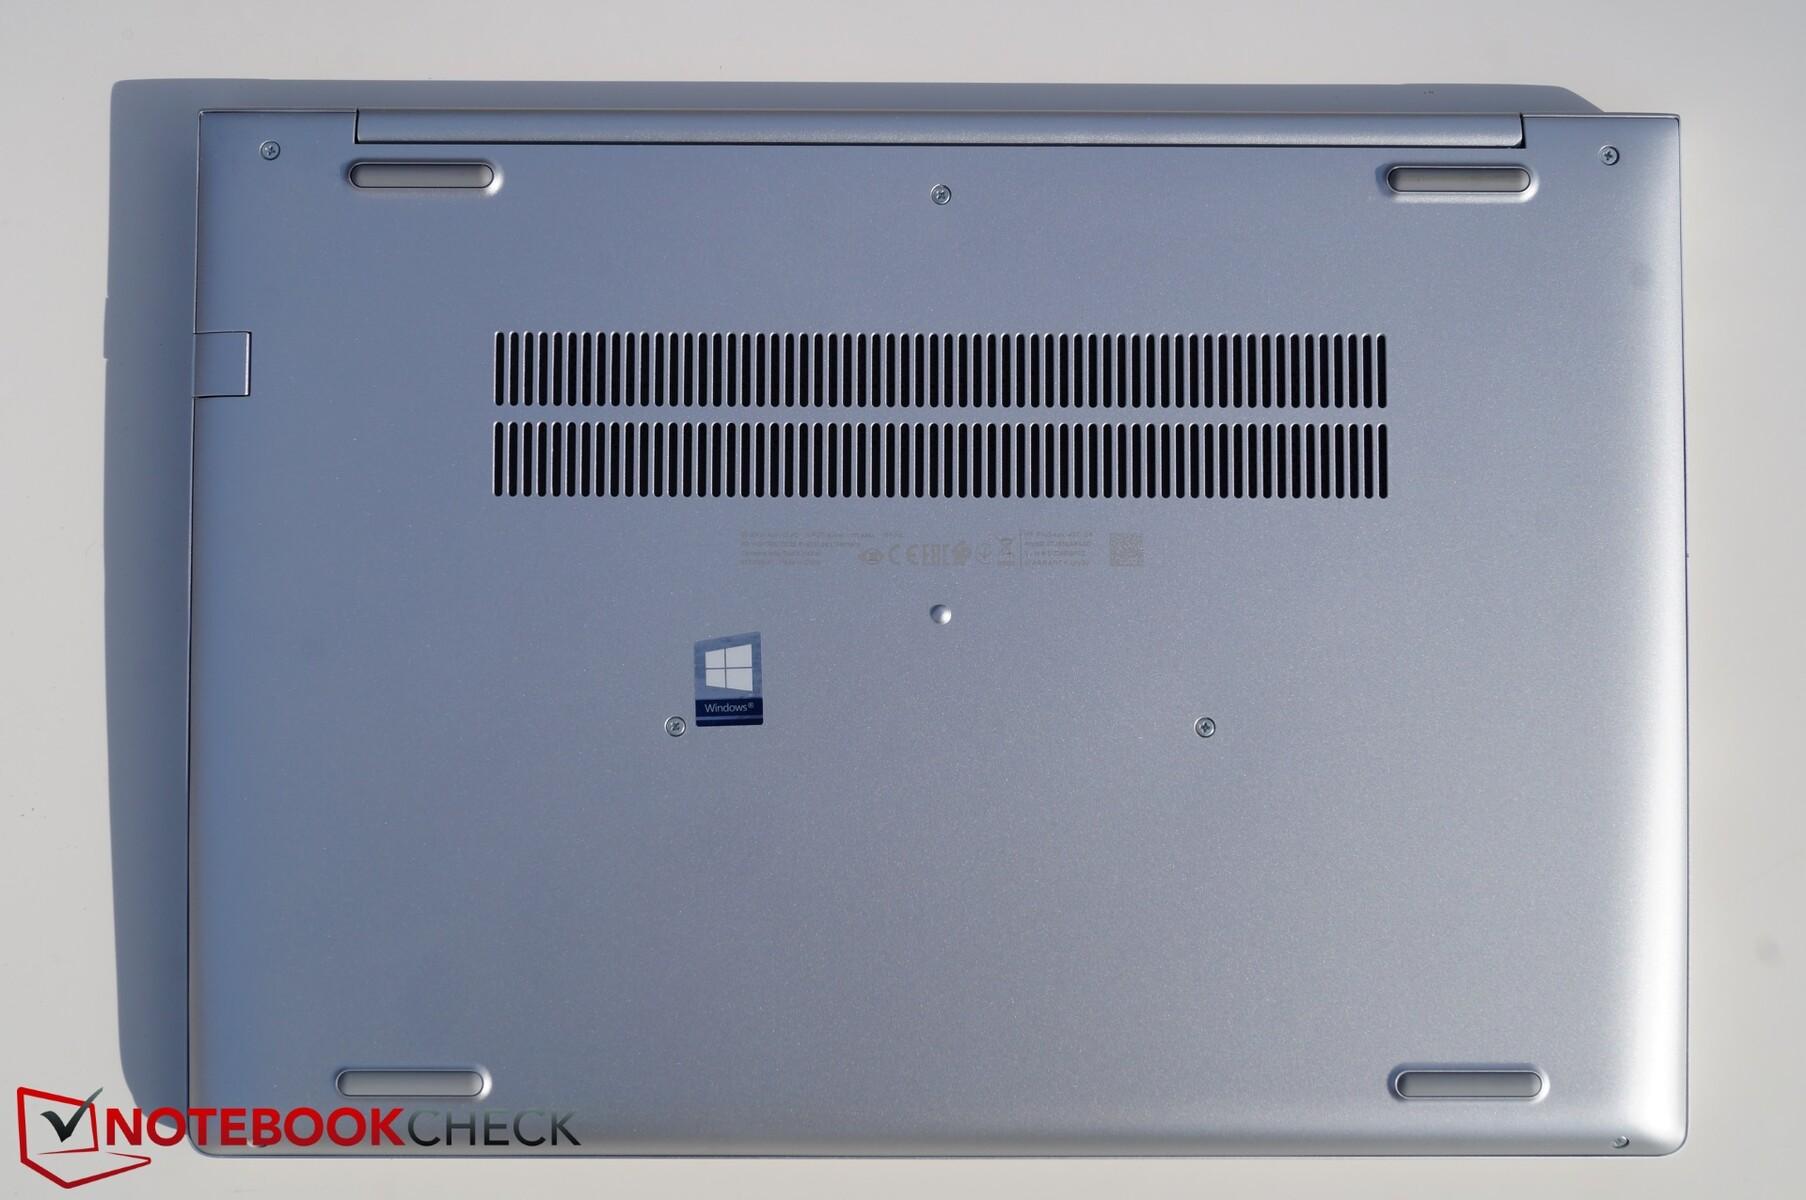 HP ProBook 450 G6 (Core i7-8565U, GeForce MX130) Laptop